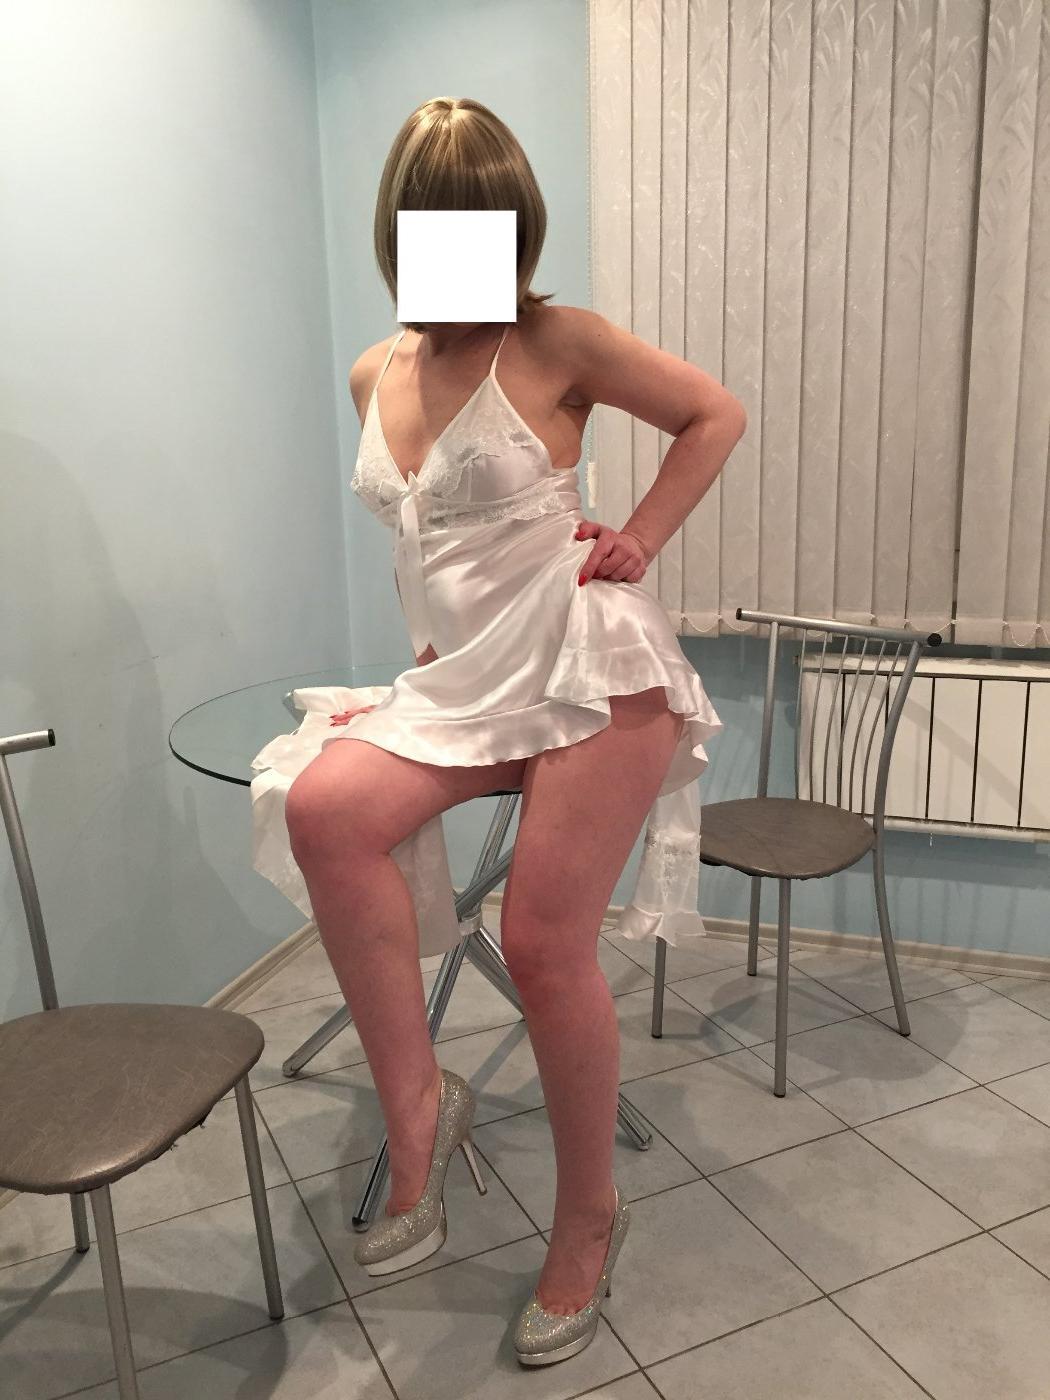 Проститутка Лека, 33 года, метро Текстильщики